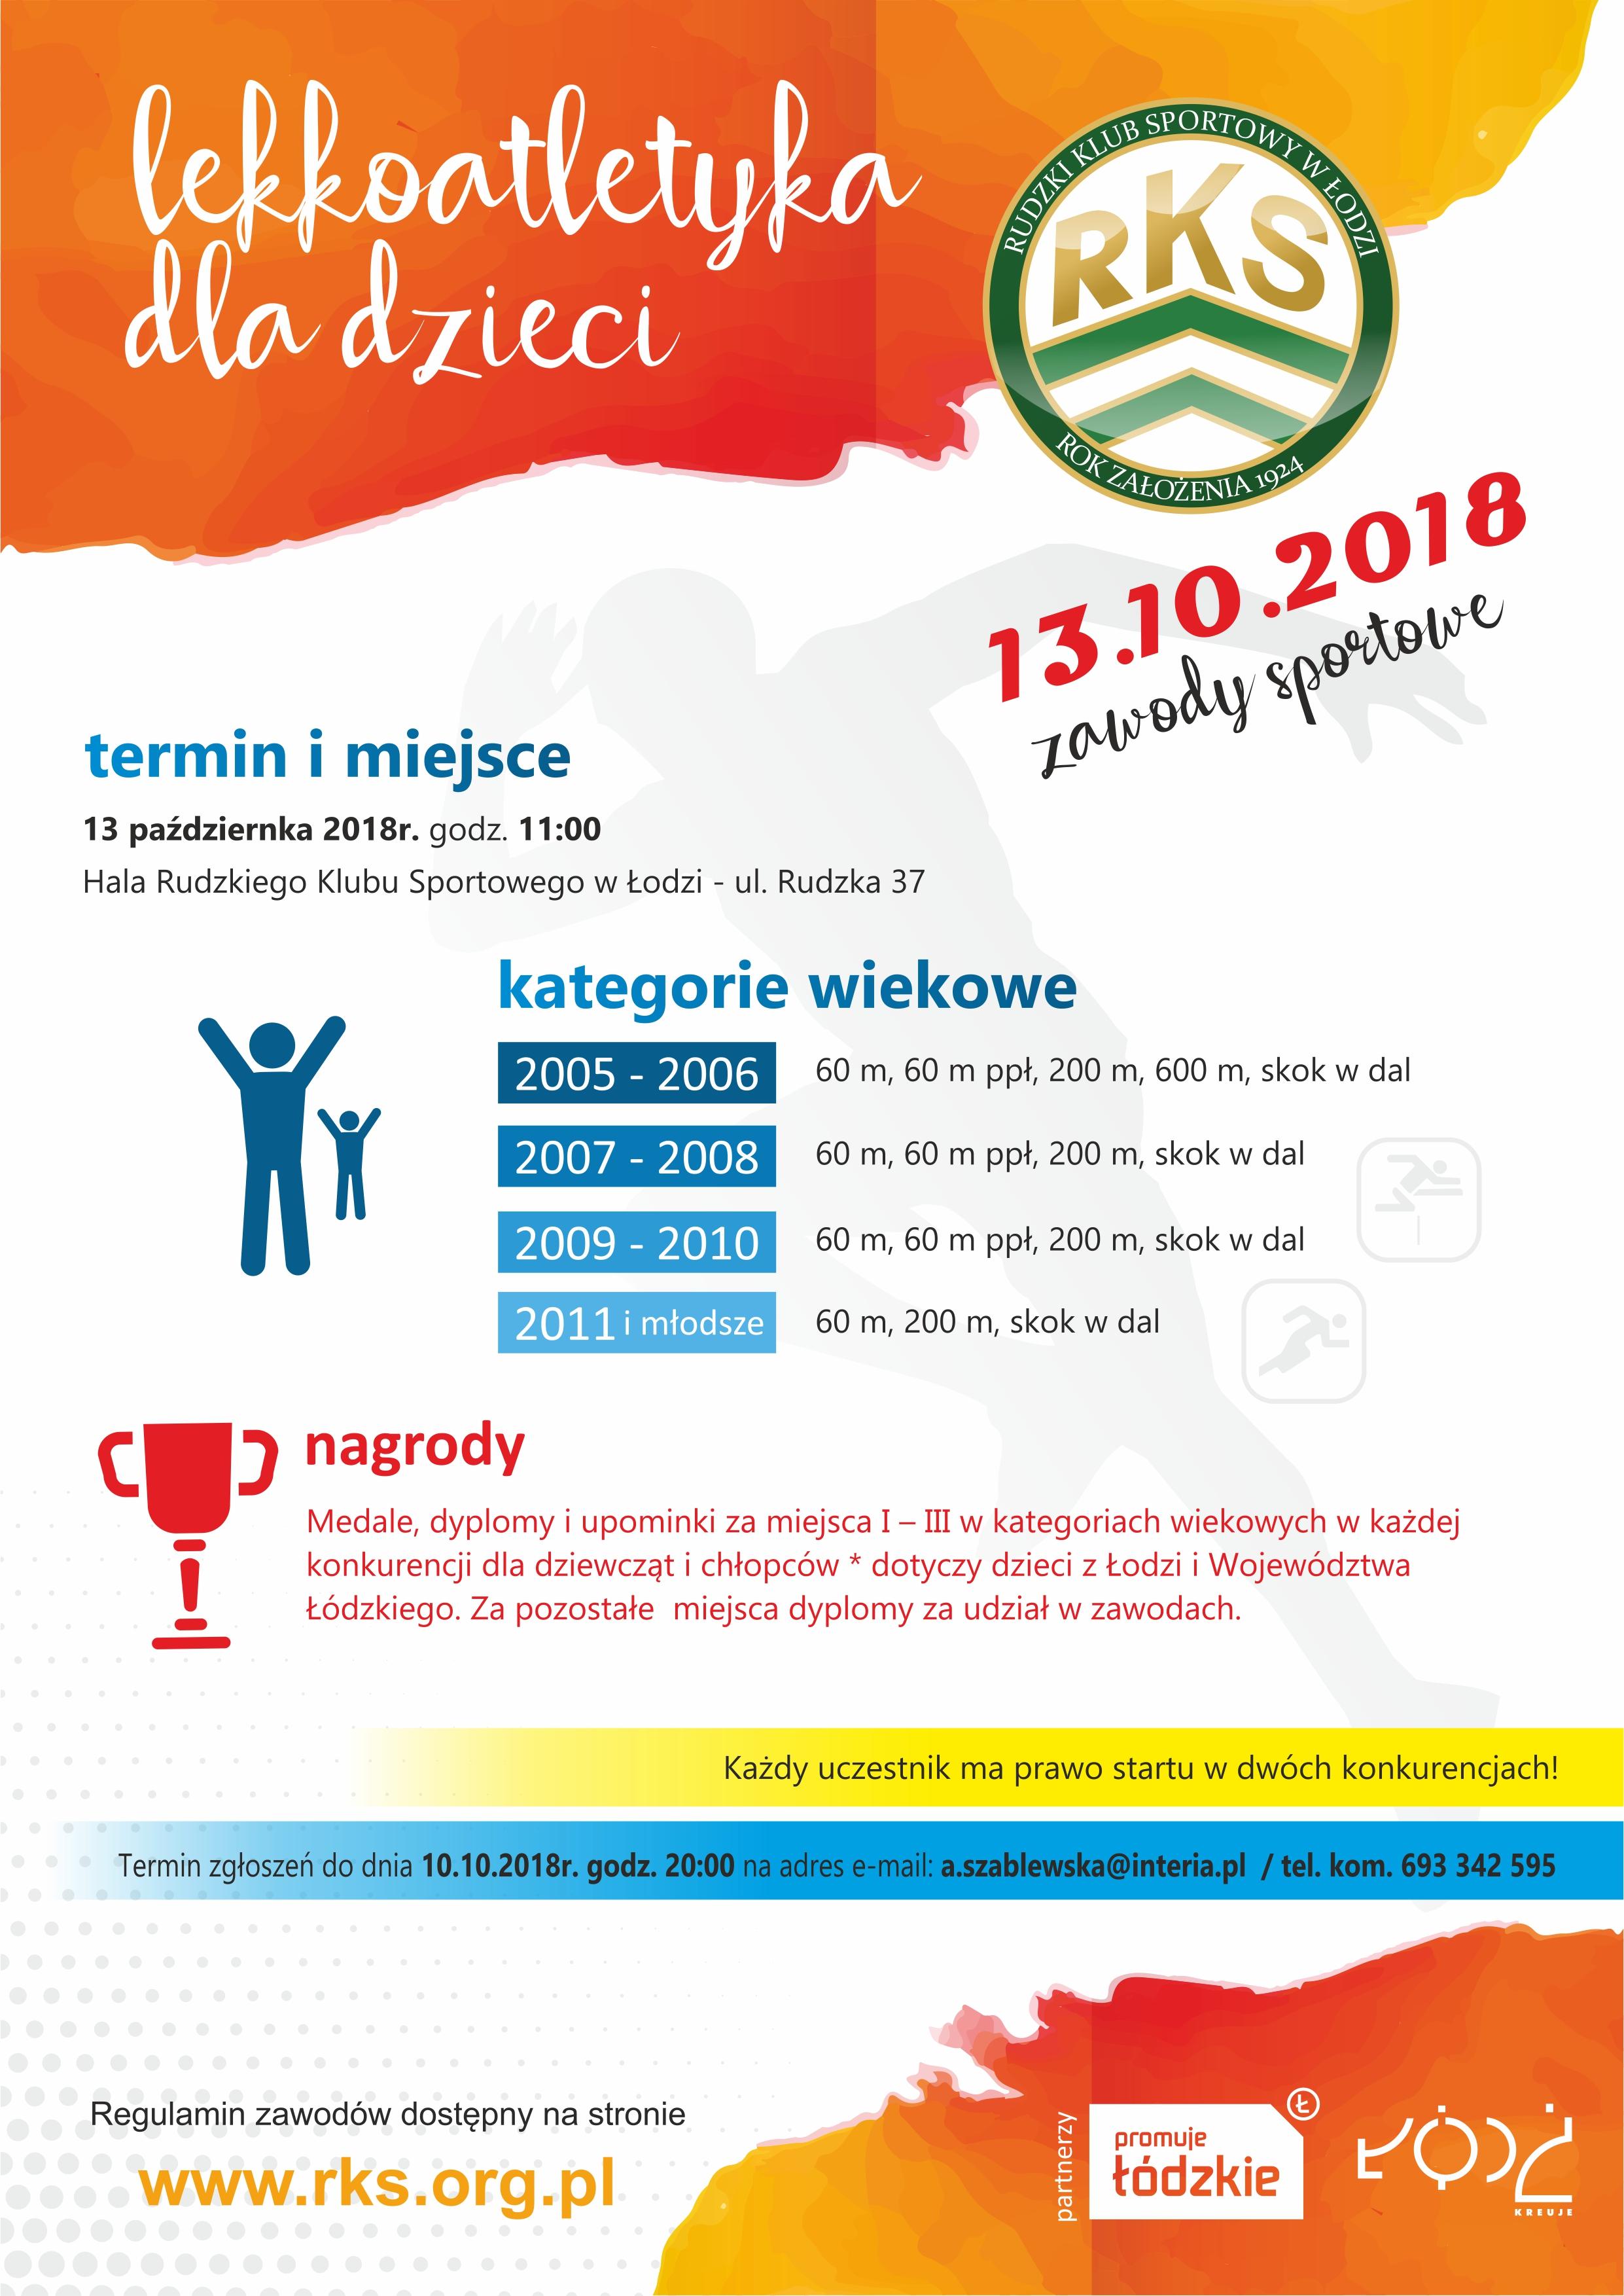 2018 plakat lekkoatletyka dla dzieci